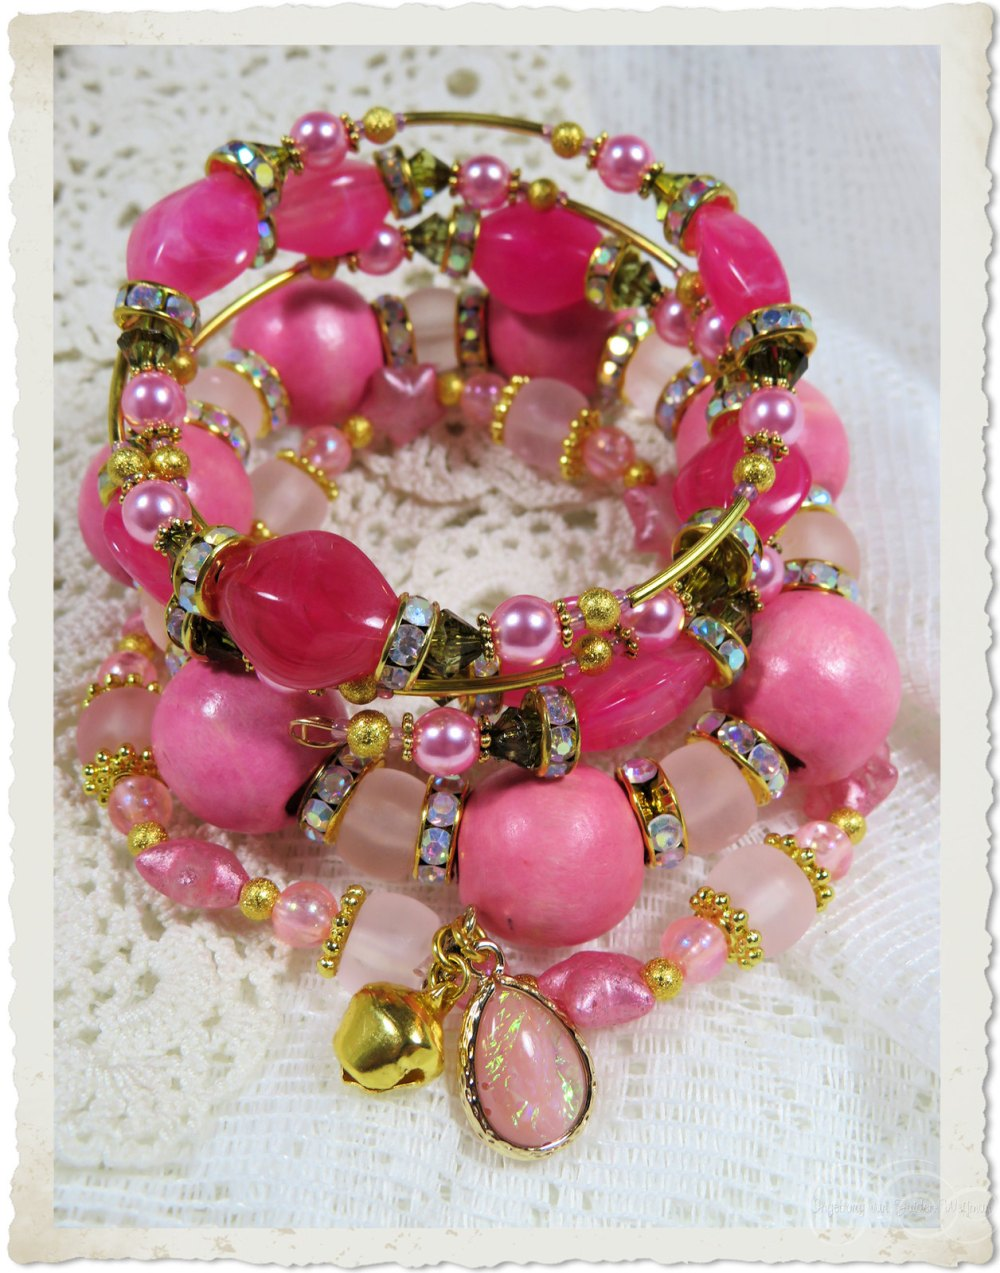 Handmade pink bracelets by Ingeborg van Zuiden